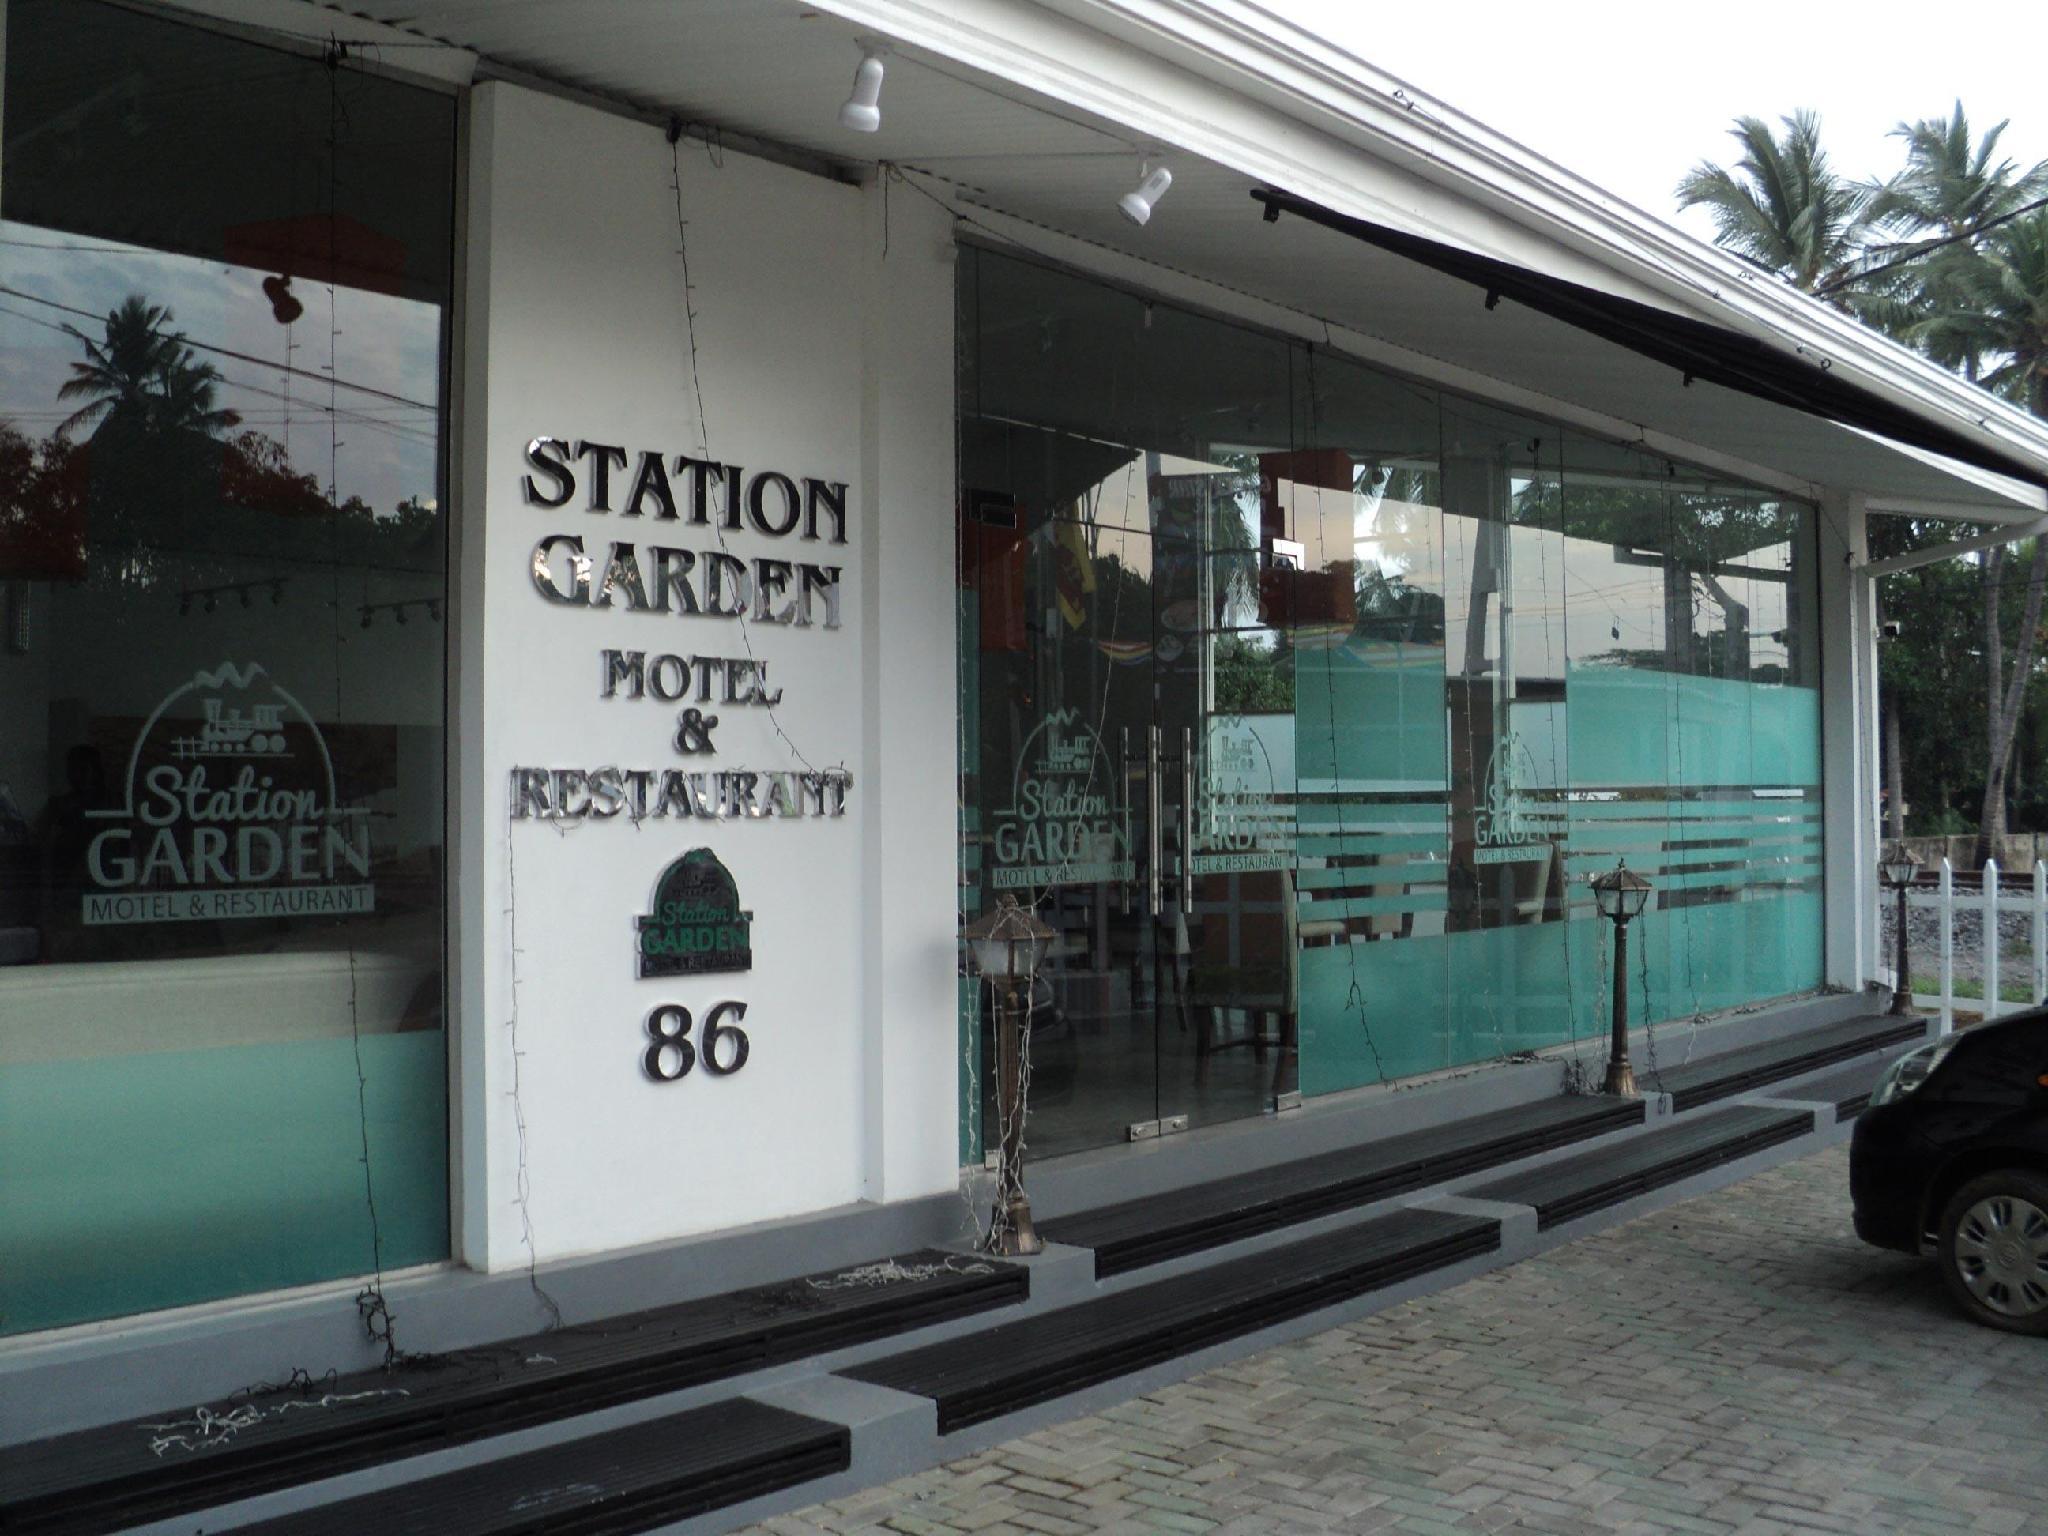 Station Garden Motel And Restaurant, Jaffna